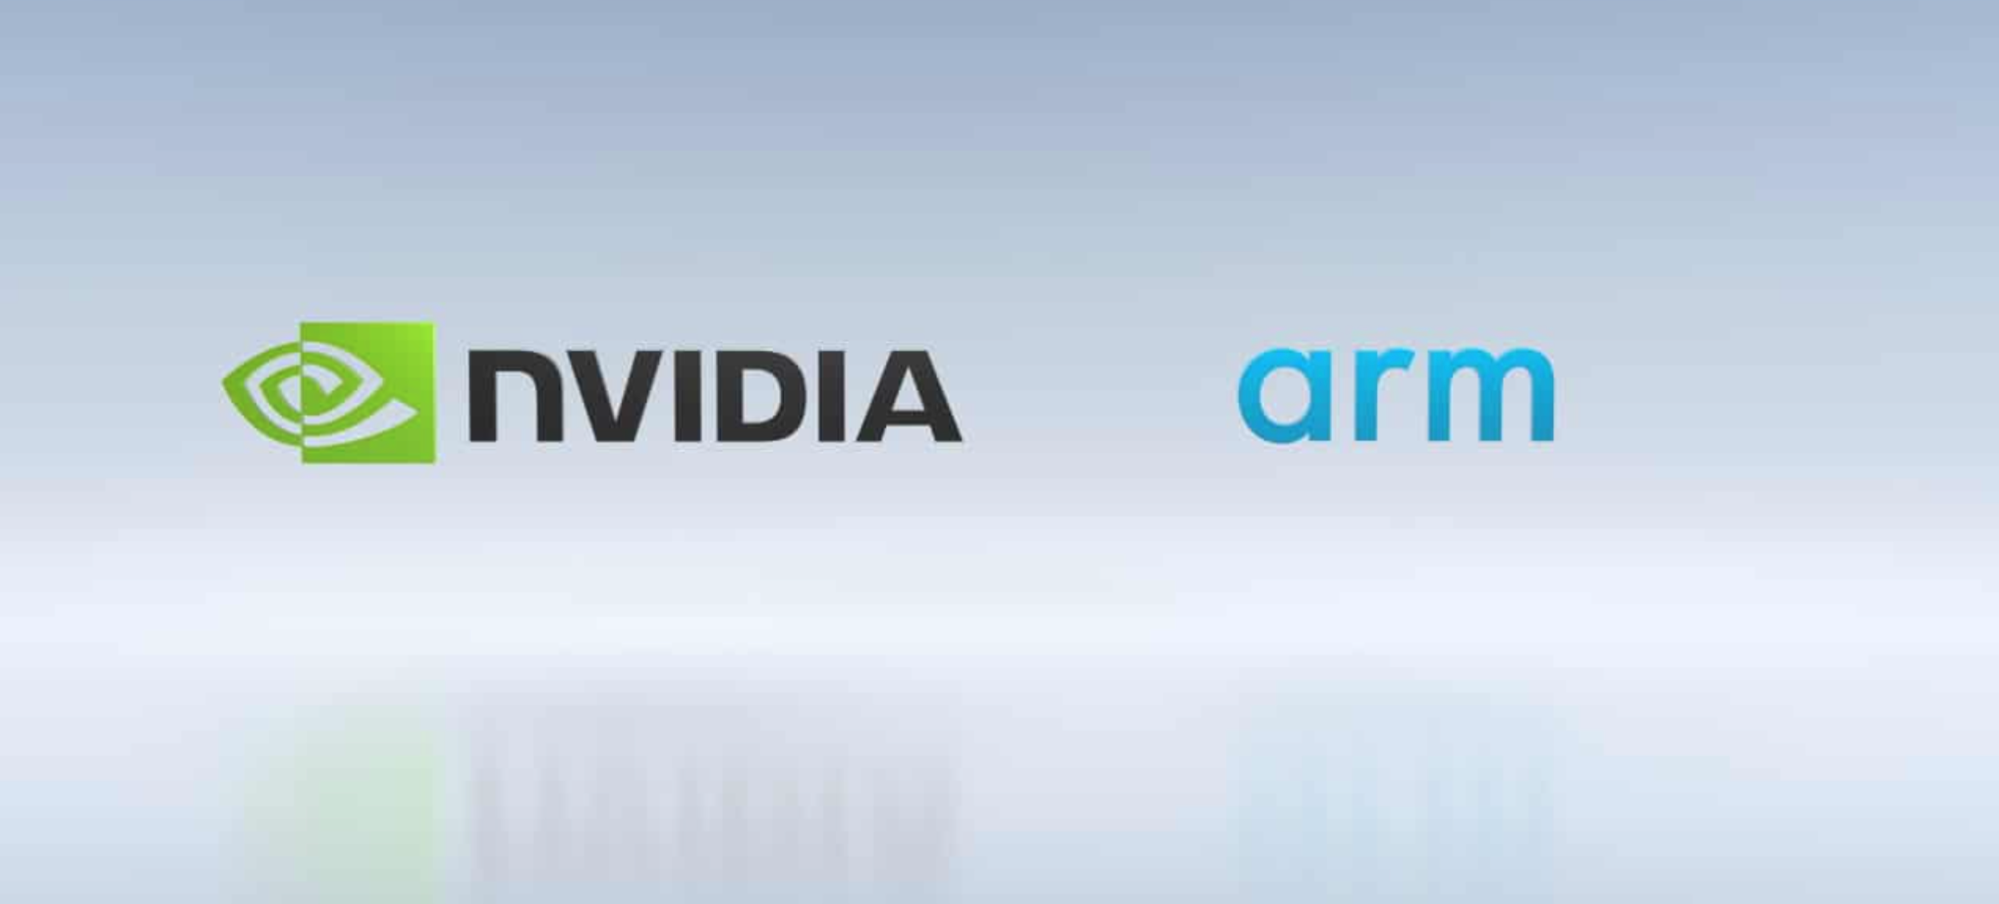 NVIDIA развивает экосистему ARM